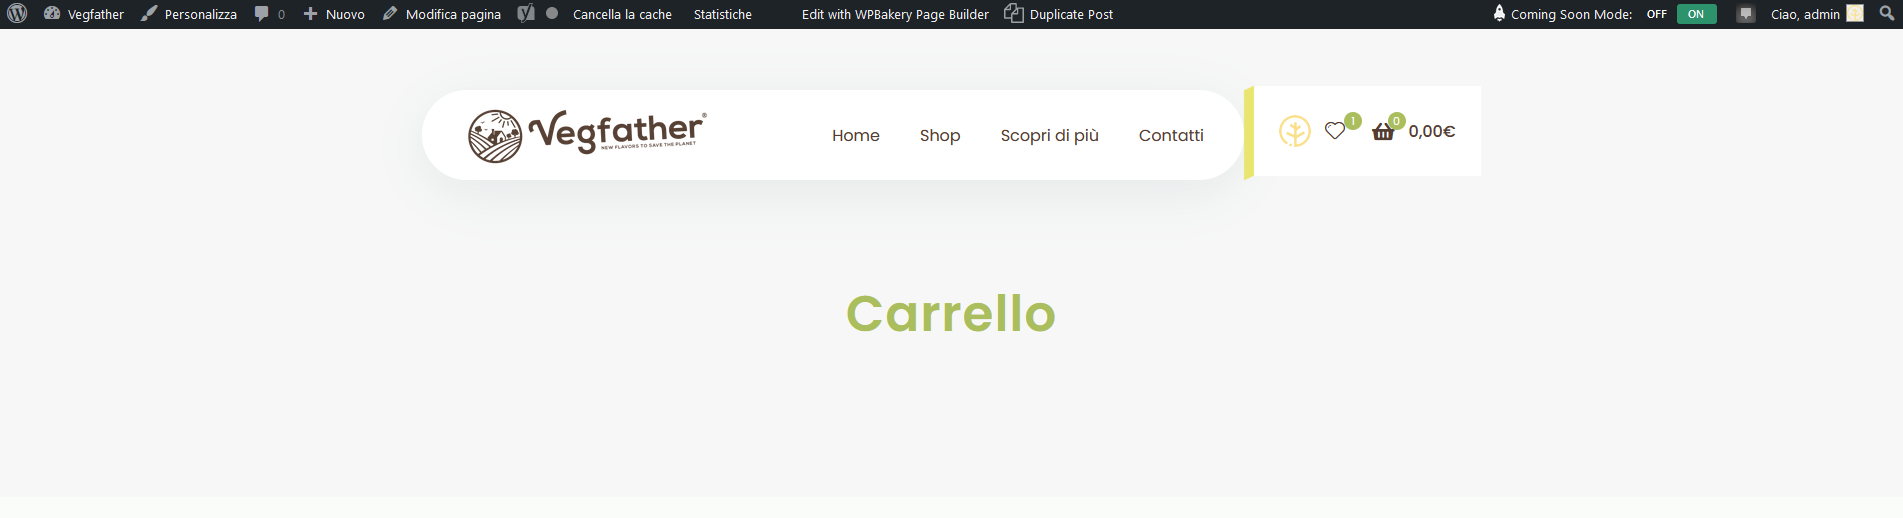 2021-09-28 10_36_49-Carrello - Vegfather – Firefox Developer Edition.png